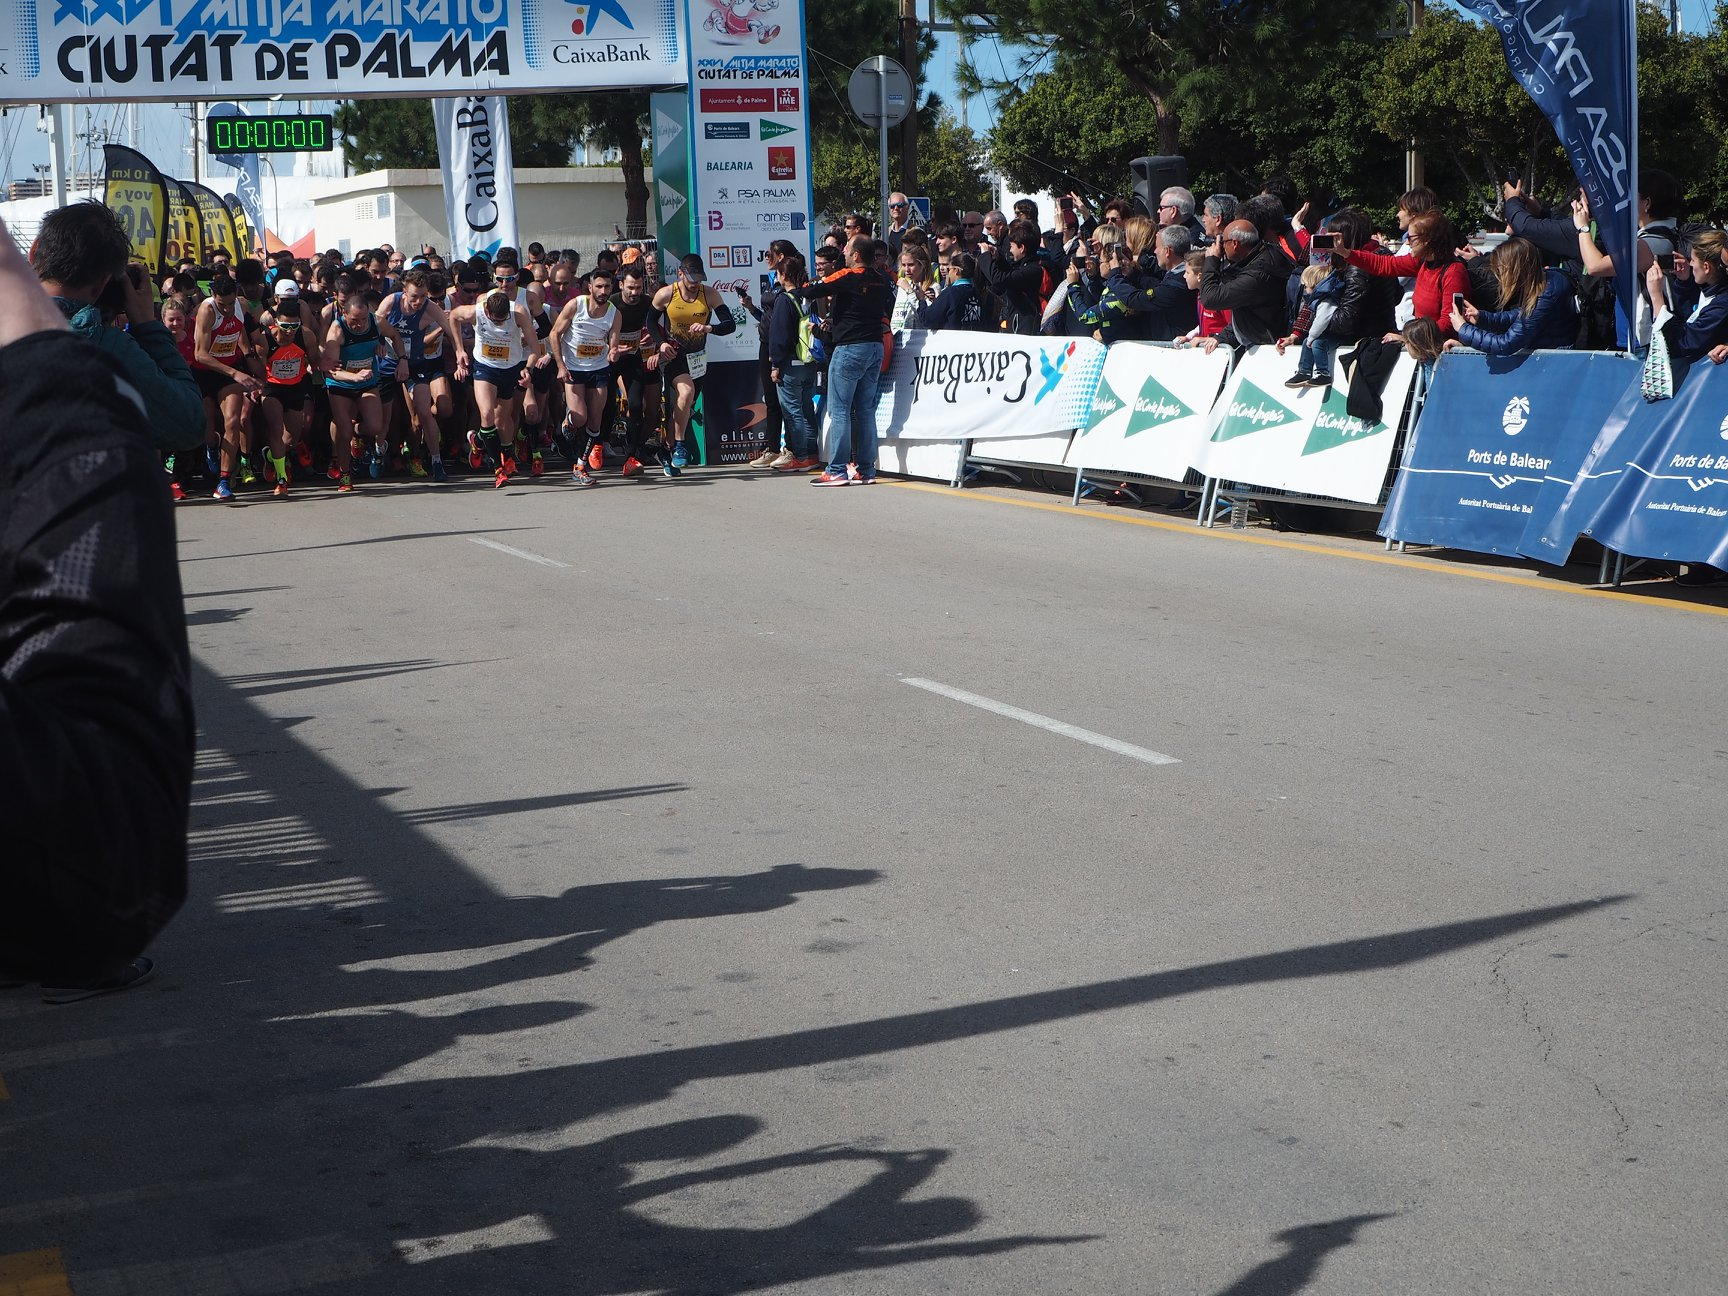 Half Marathon Palma de Mallorca: Start